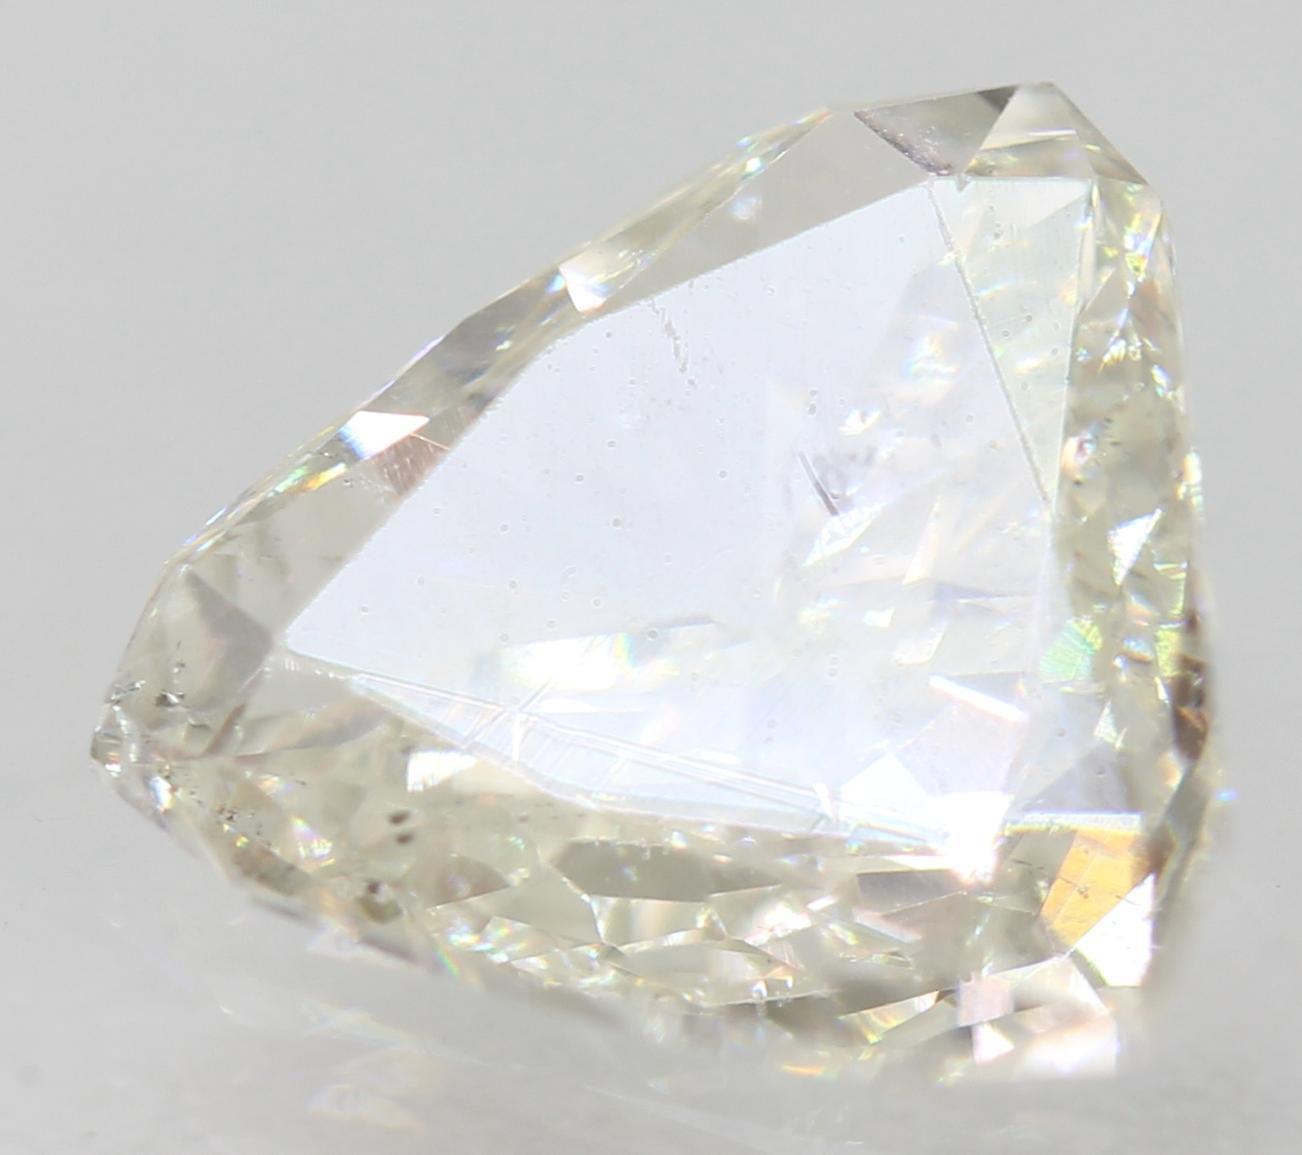 Certified 0.83 Carat G VS2 Triangle Enhanced Natural Loose Diamond 7.63x7.28mm